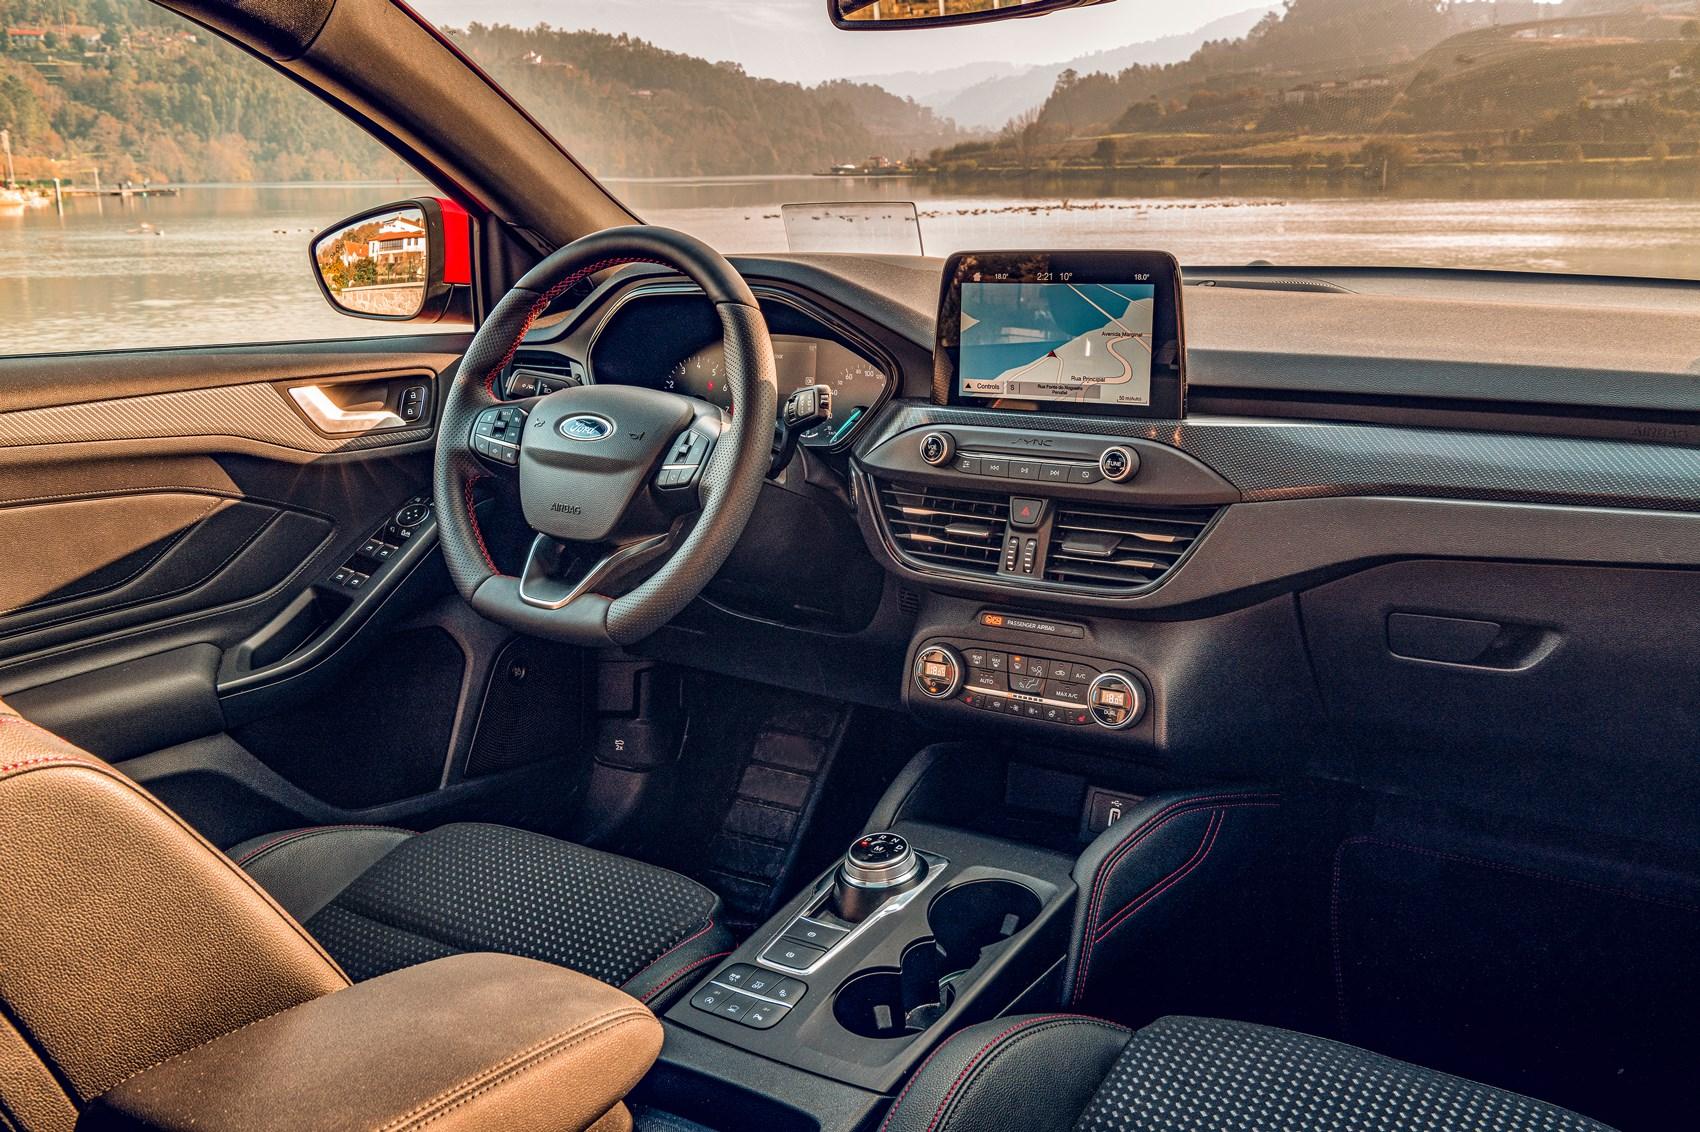 Vw Golf Vs Bmw 1 Series Vs Ford Focus 2020 Triple Test Review Car Magazine